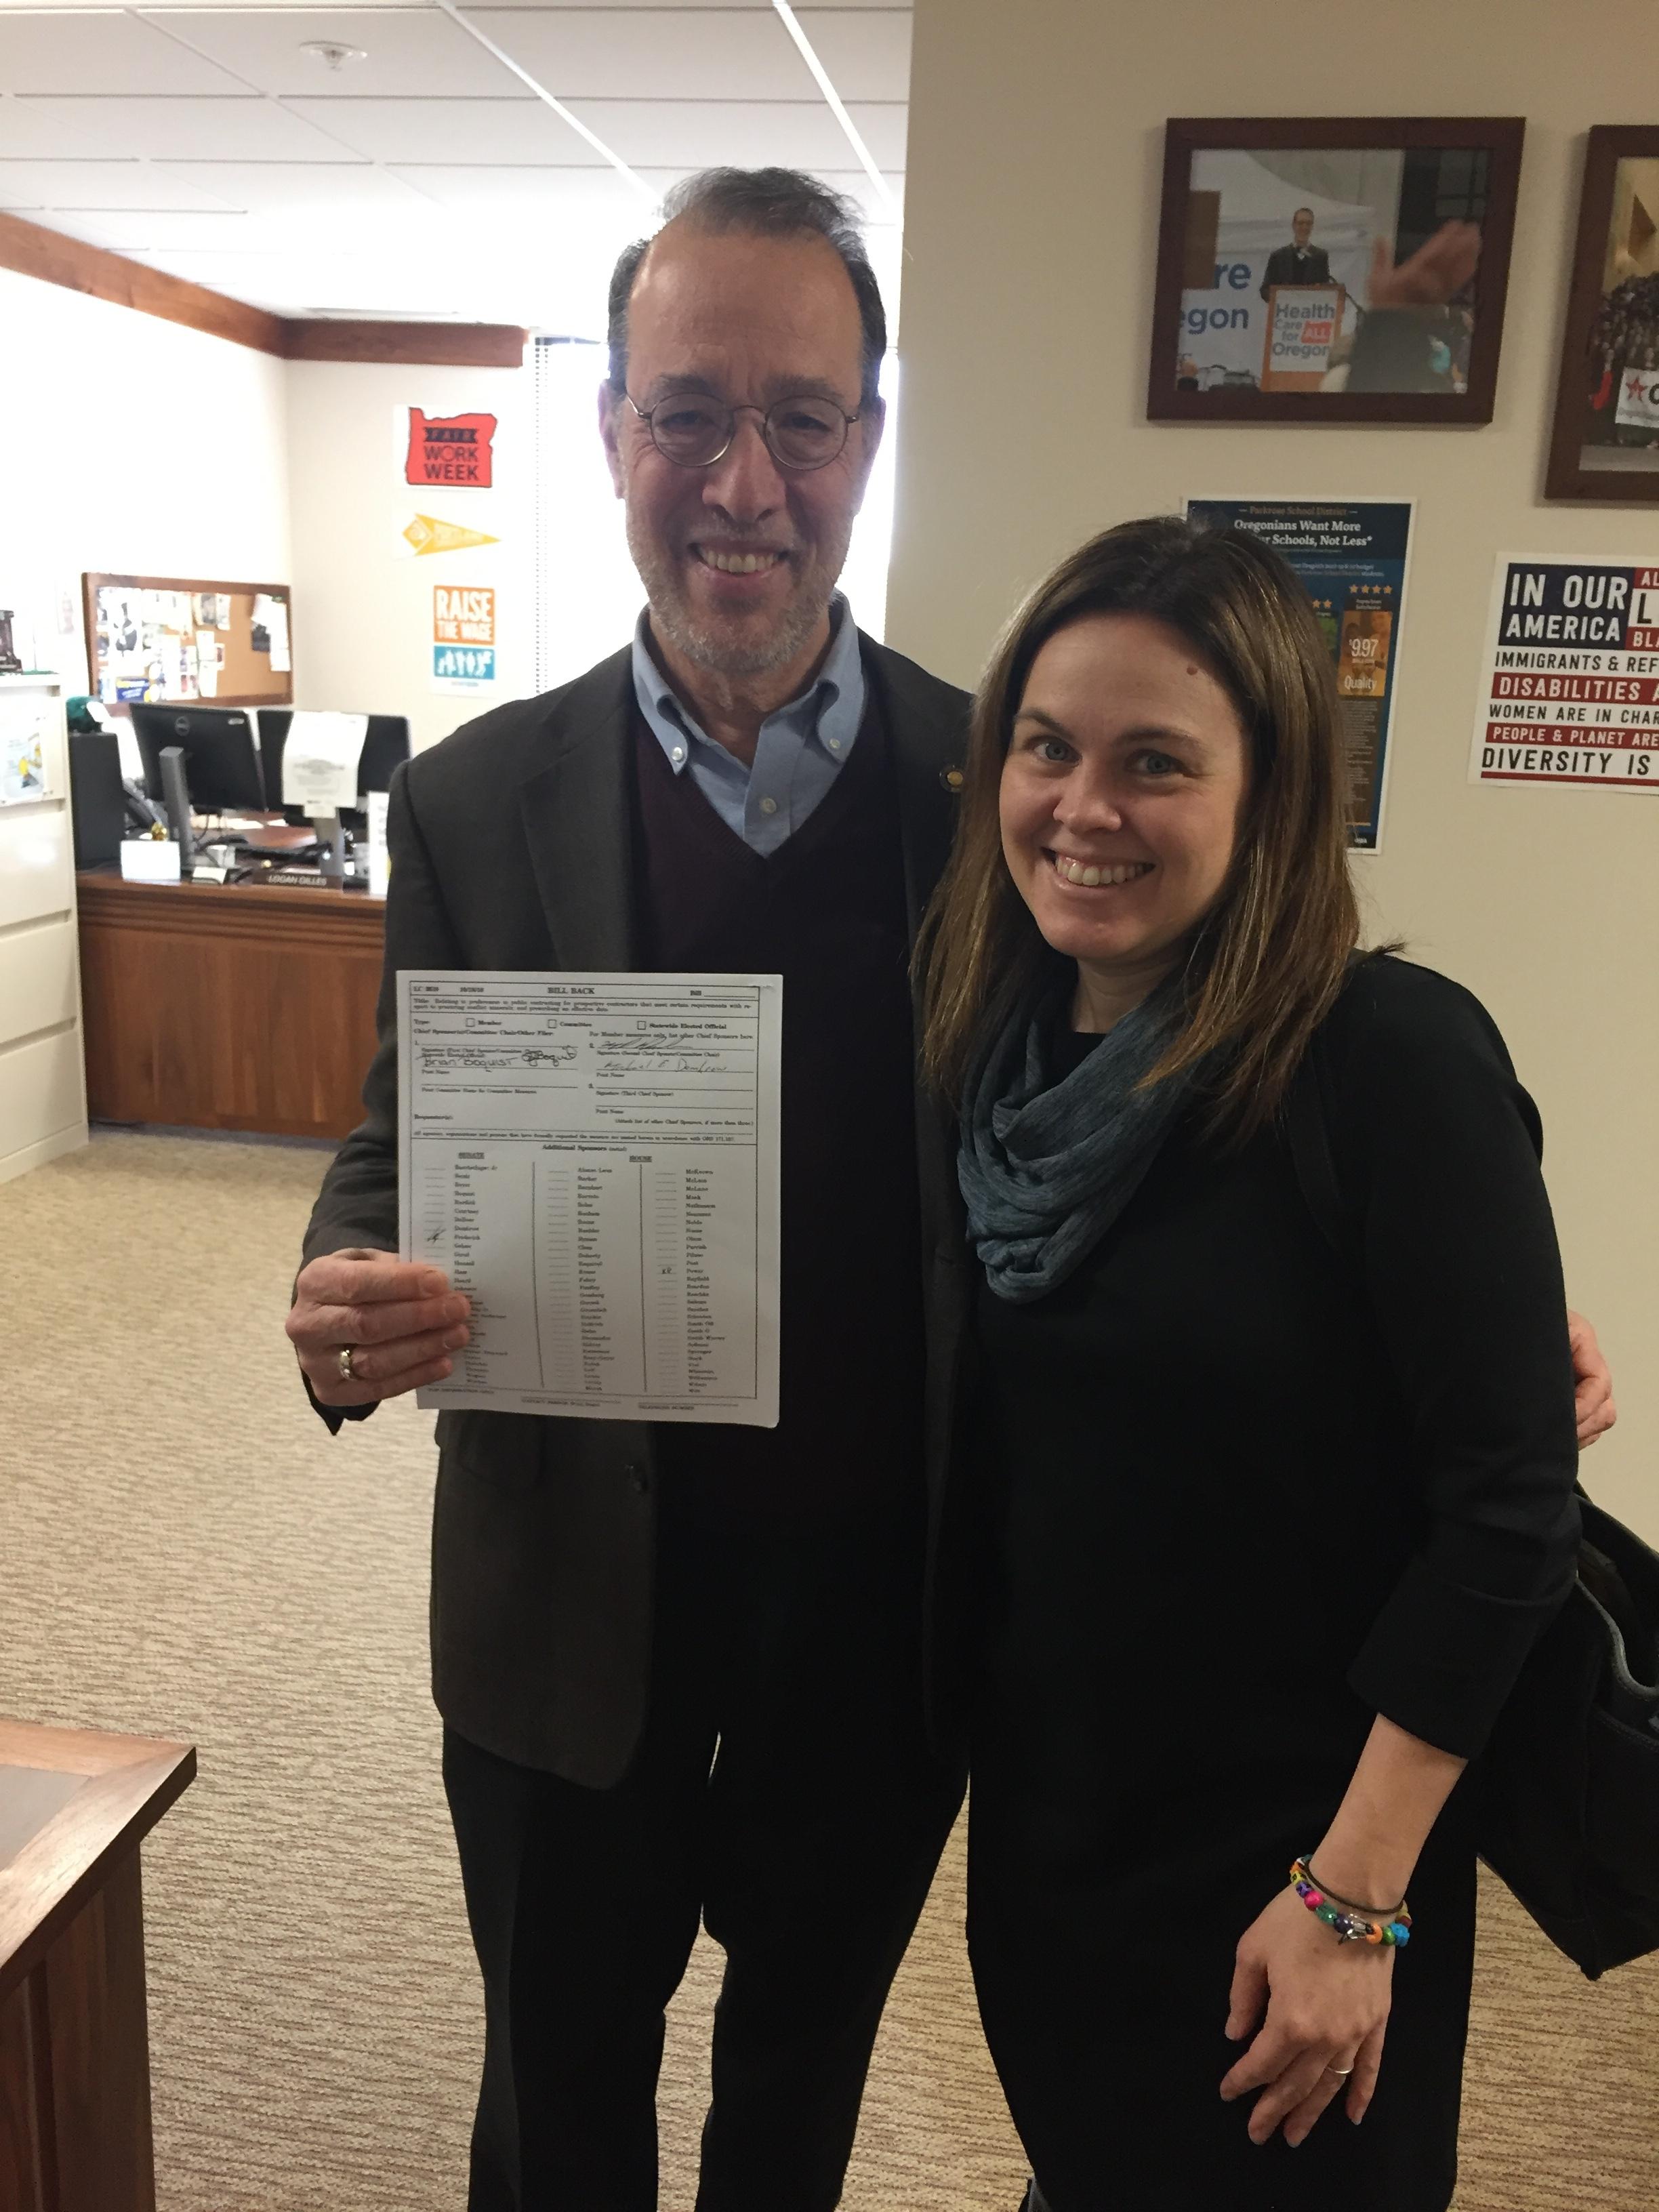 Oregon Senator Michael Dembrow and Never Again Coalition Director Lauren Fortgang